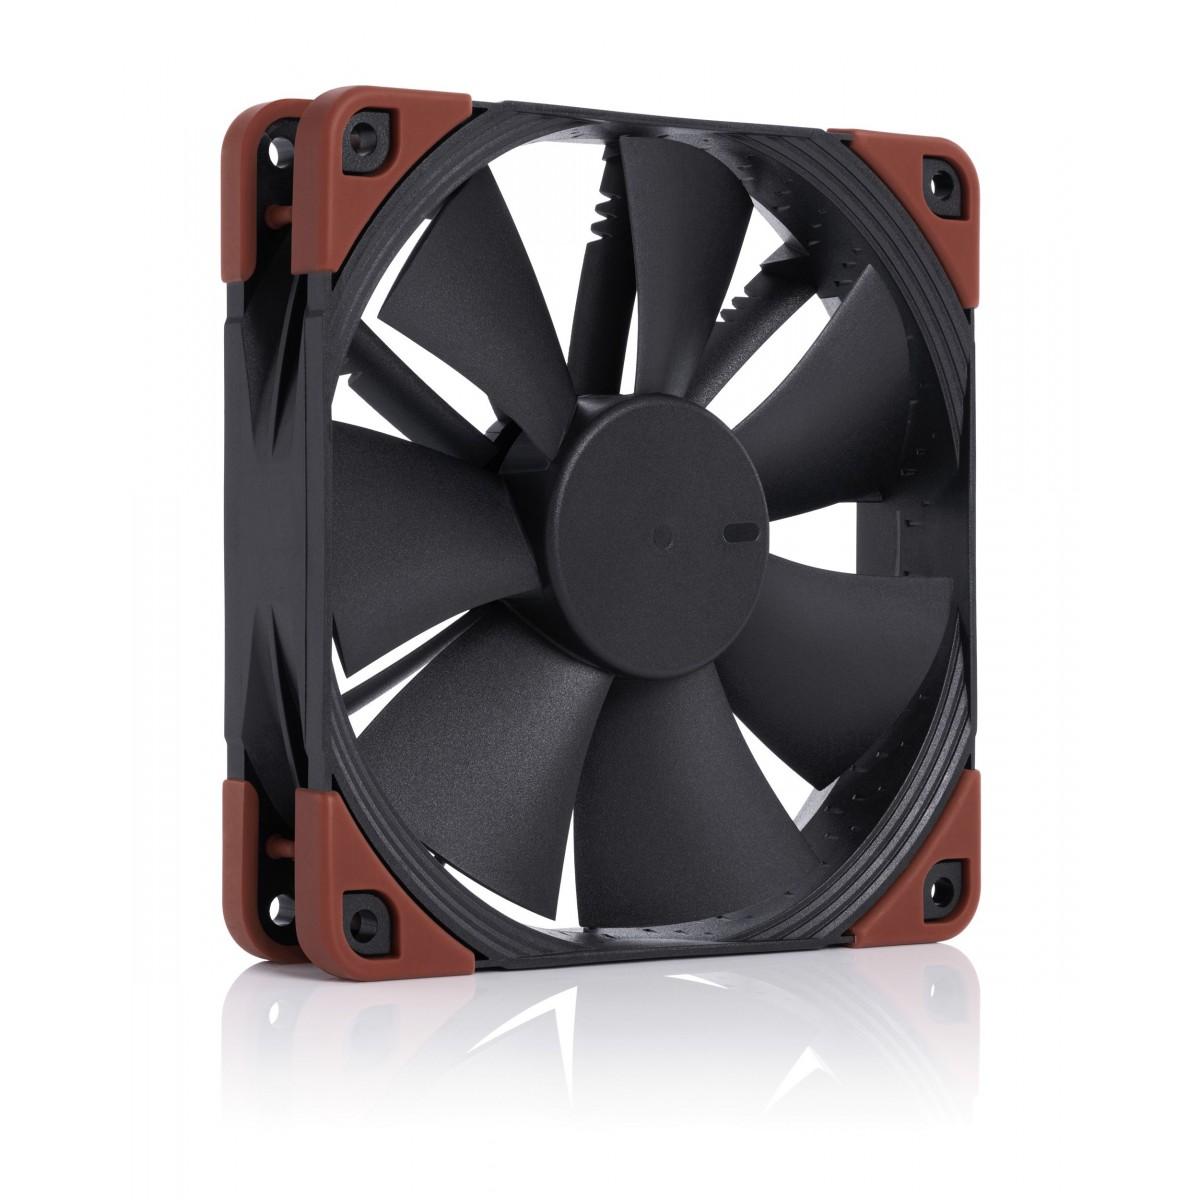 Cooler para Gabinete Noctua NF-F12 industrialPPC-2000 IP67, Black, 120mm, NF-F12 iPPC-2000 IP67